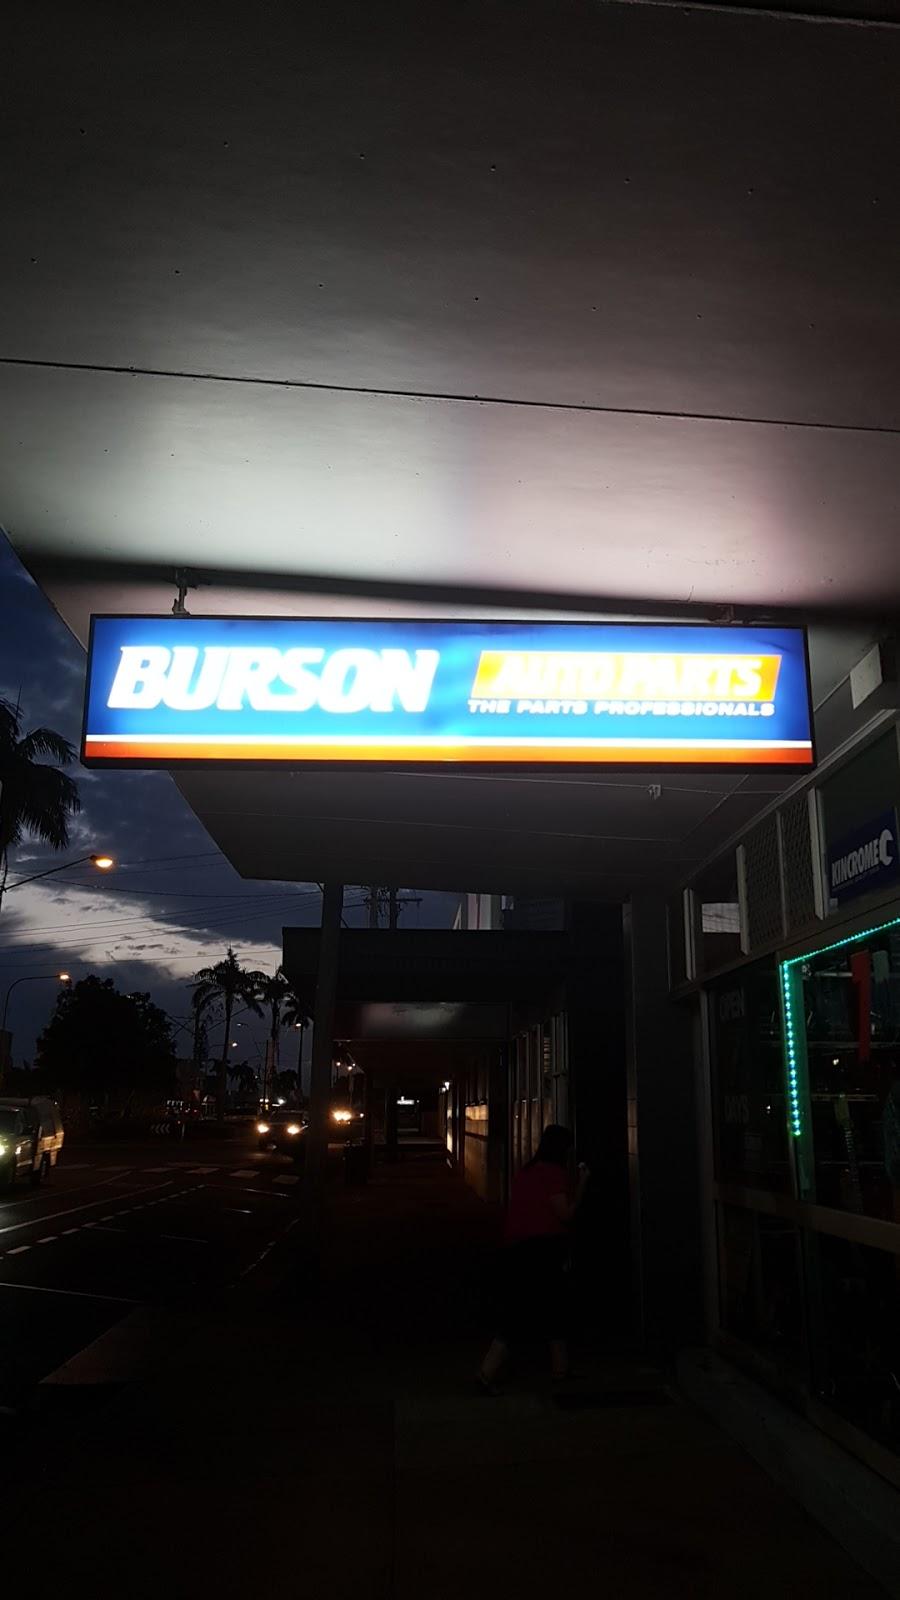 Burson Auto Parts | car repair | 212 Victoria St, Mackay QLD 4740, Australia | 0749511488 OR +61 7 4951 1488